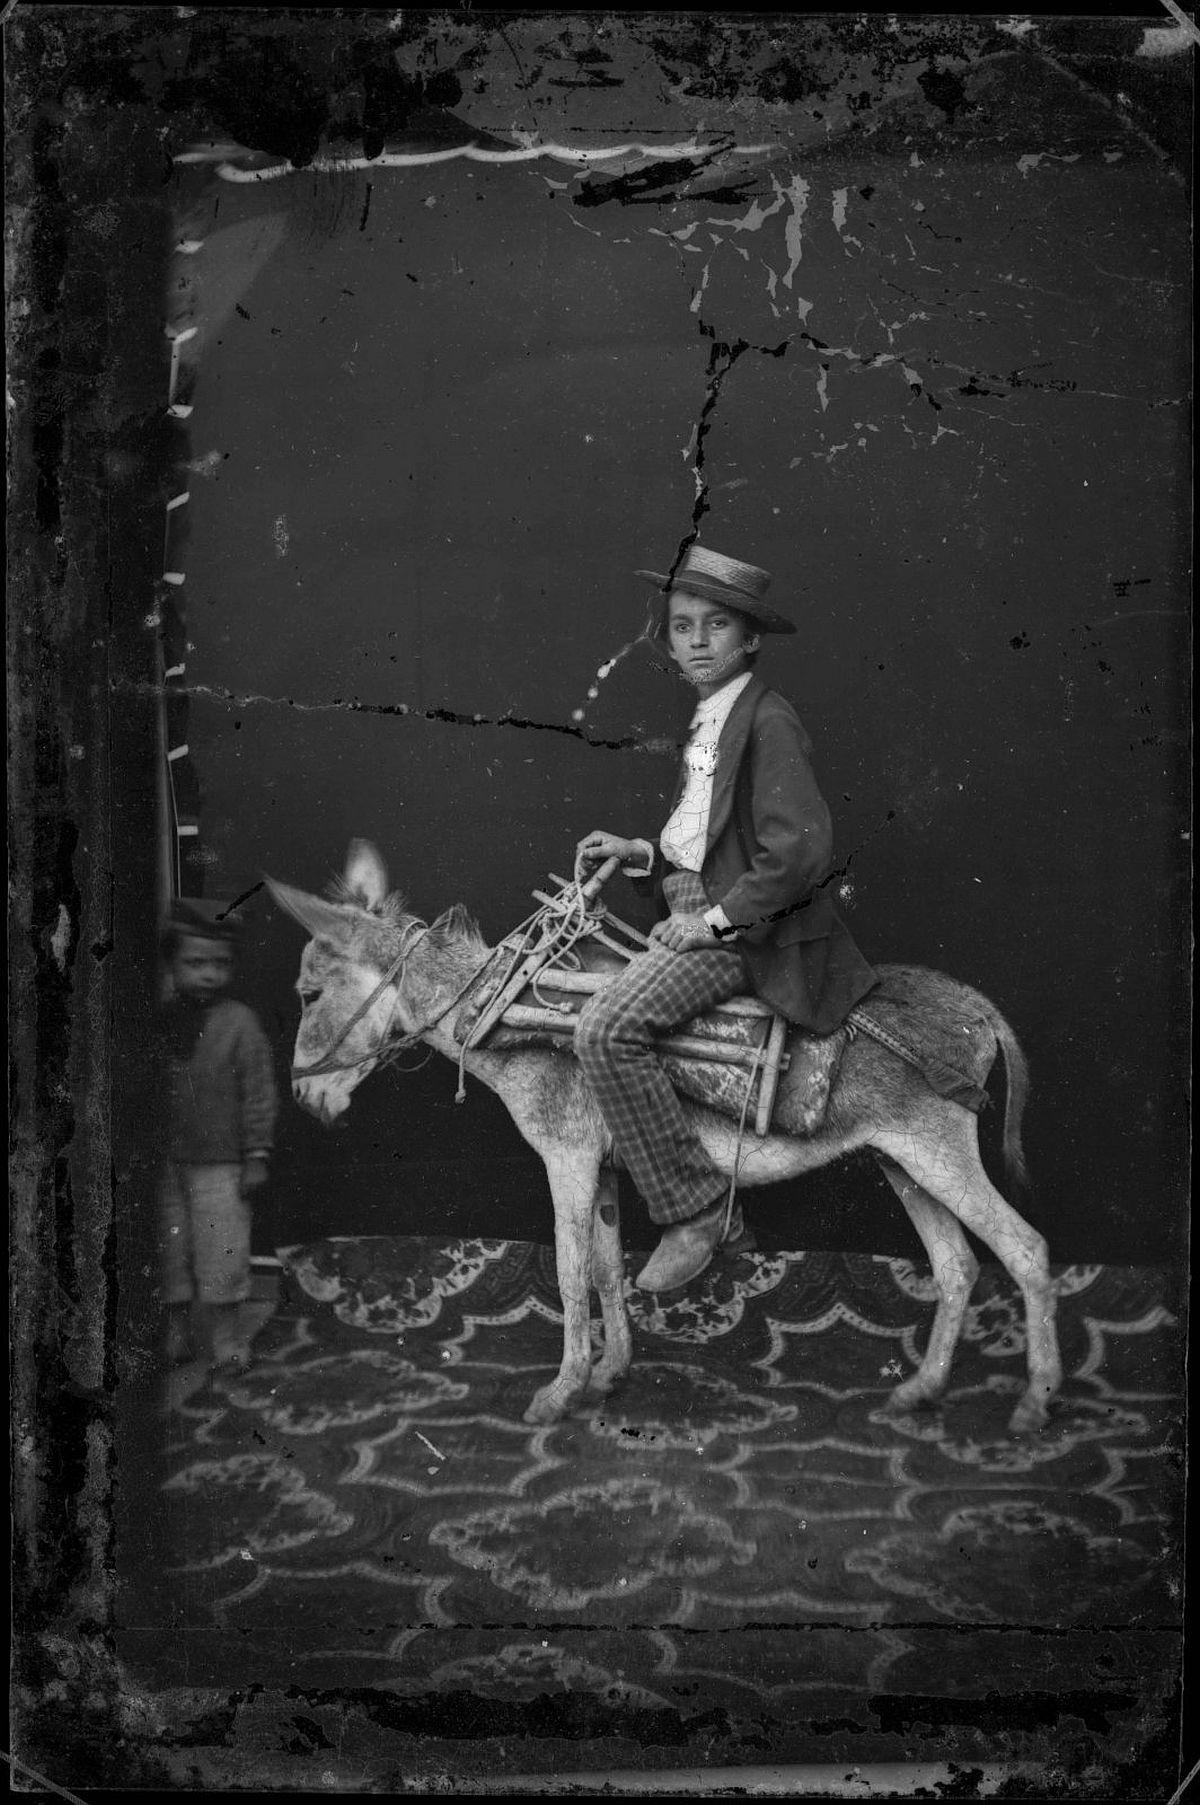 the-marubi-dynasty-a-hundred-years-of-albanian-studio-photography-05